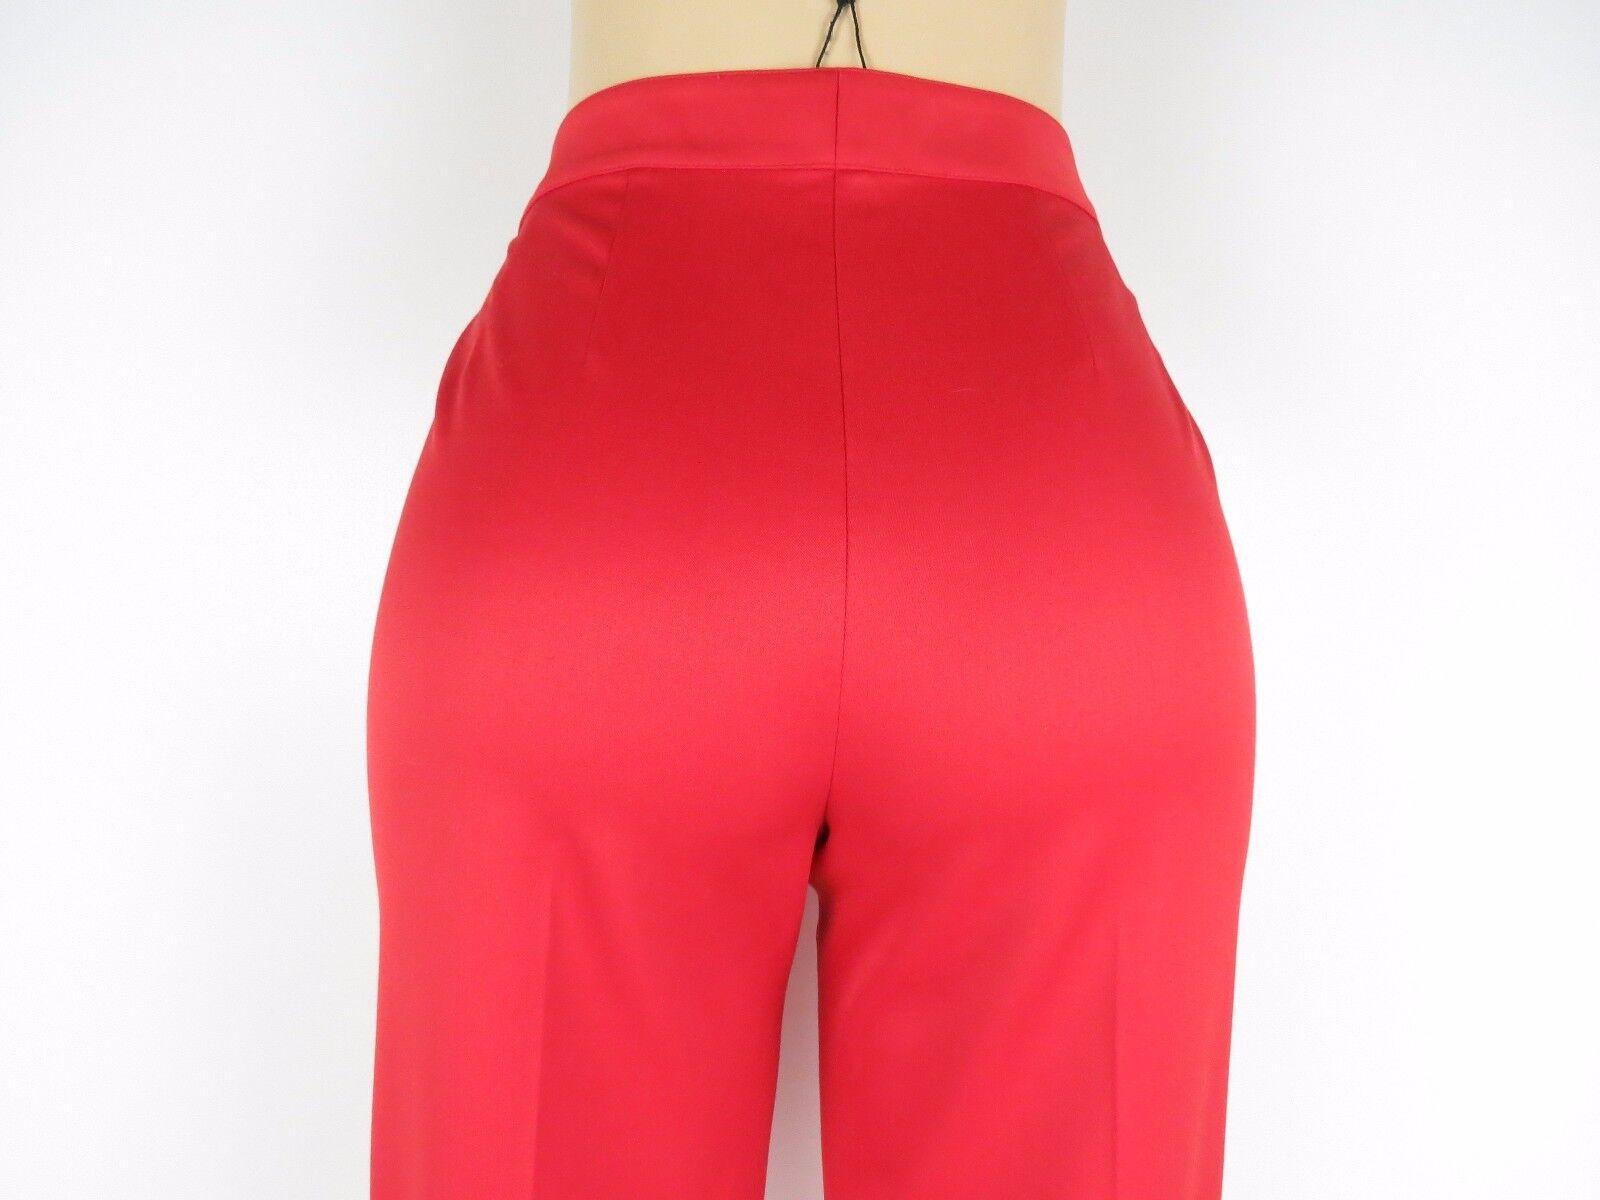 NWT St John Essentials Pants Straight Leg, Venetian Red,Size 10, Retail  595